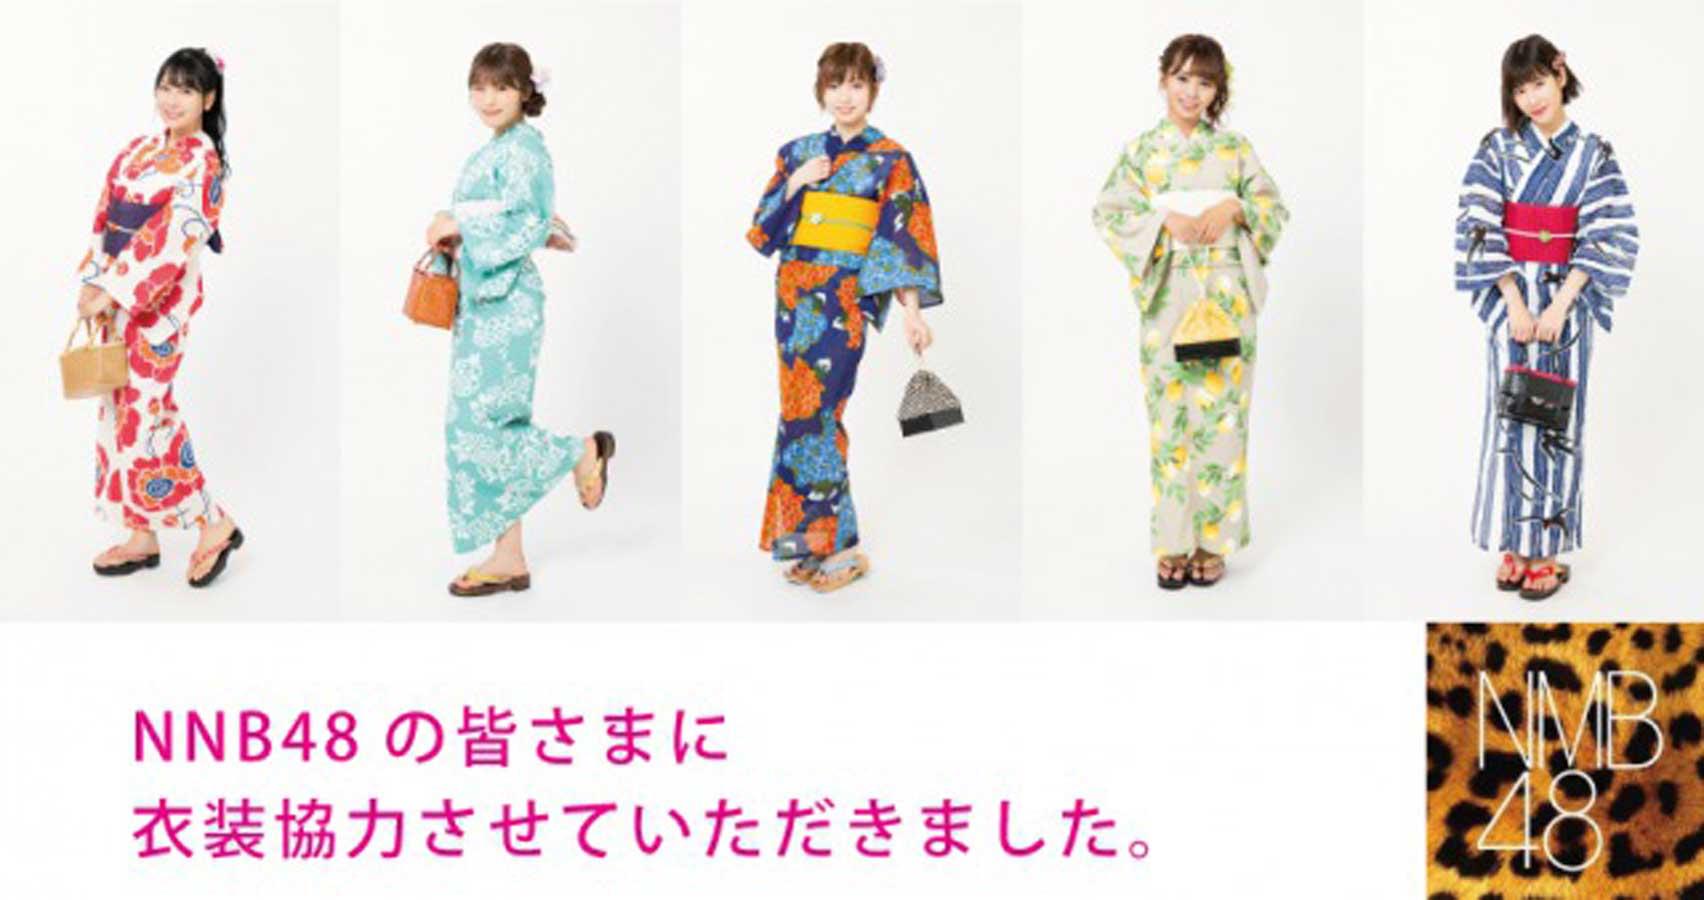 NNB48皆様に衣装提供